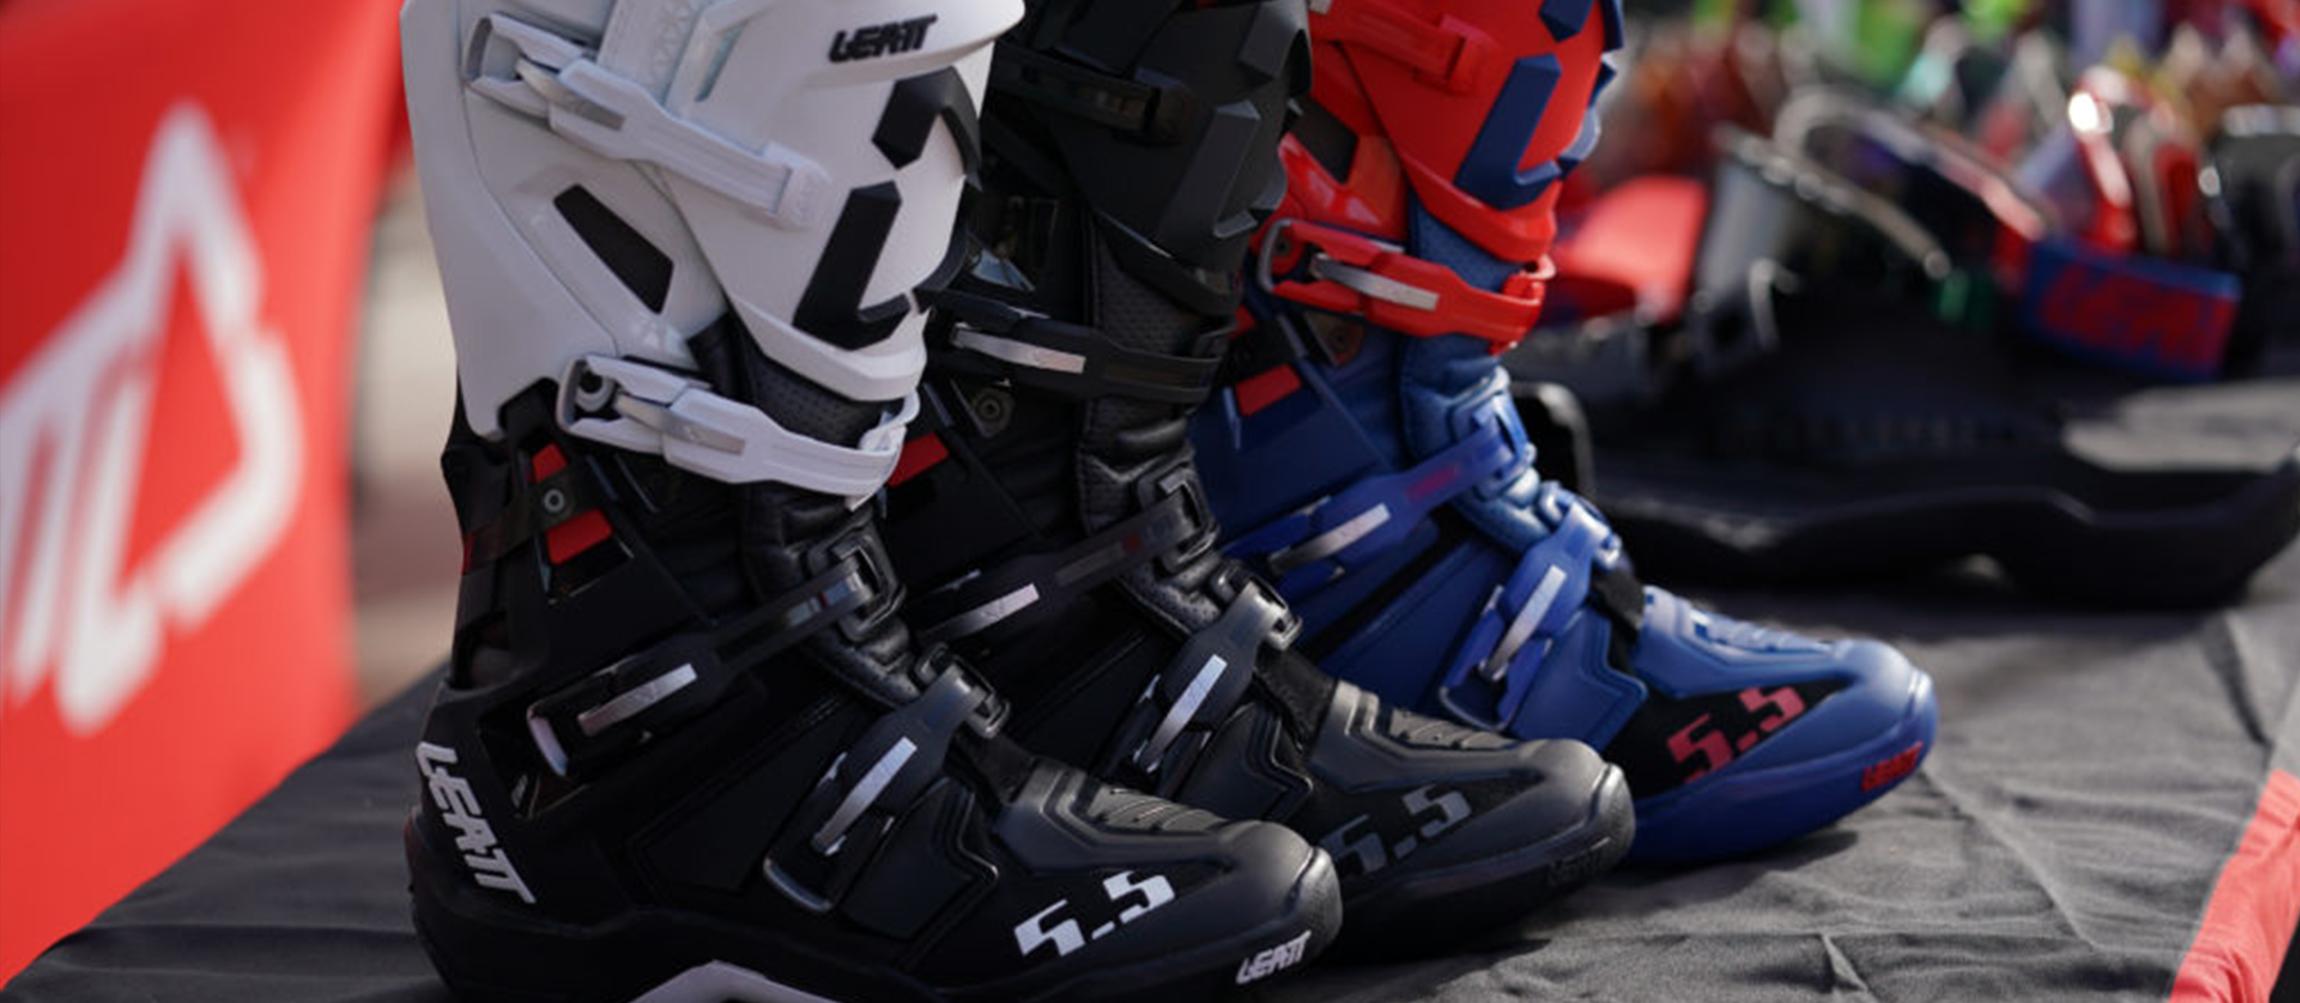 Motocross-Boots